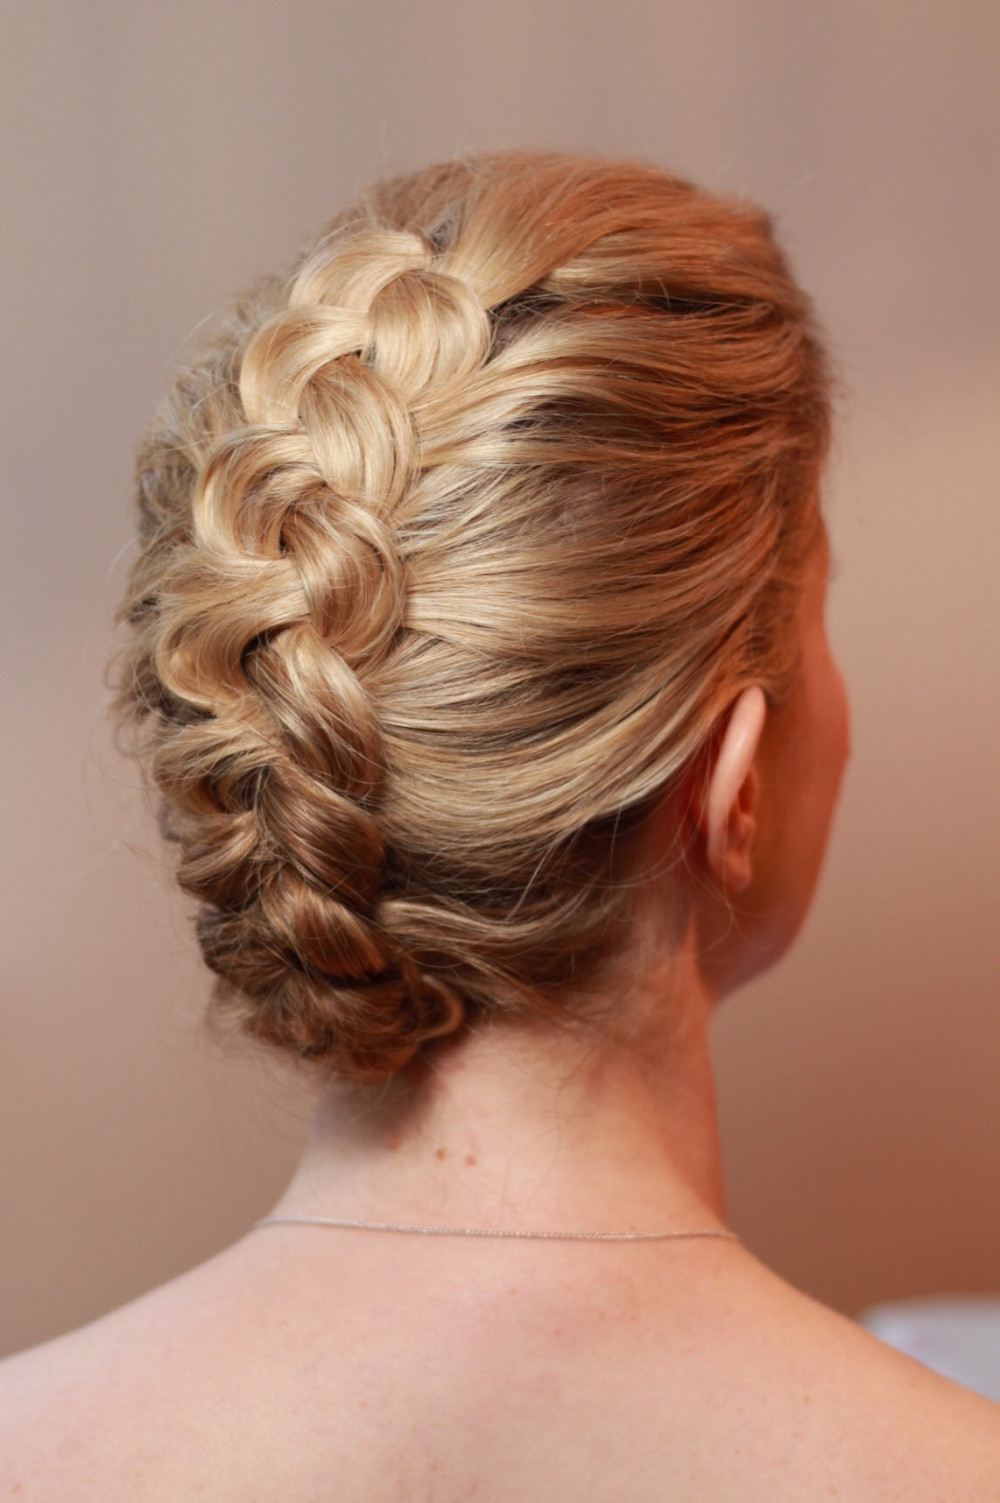 Simple and elegant Dutch braid. - Make Me Bridal Artist: Amanda Roberts Hair & Makeup. Photography by: Amanda Roberts. #blonde #hairup #dutchbraid #dutchplait